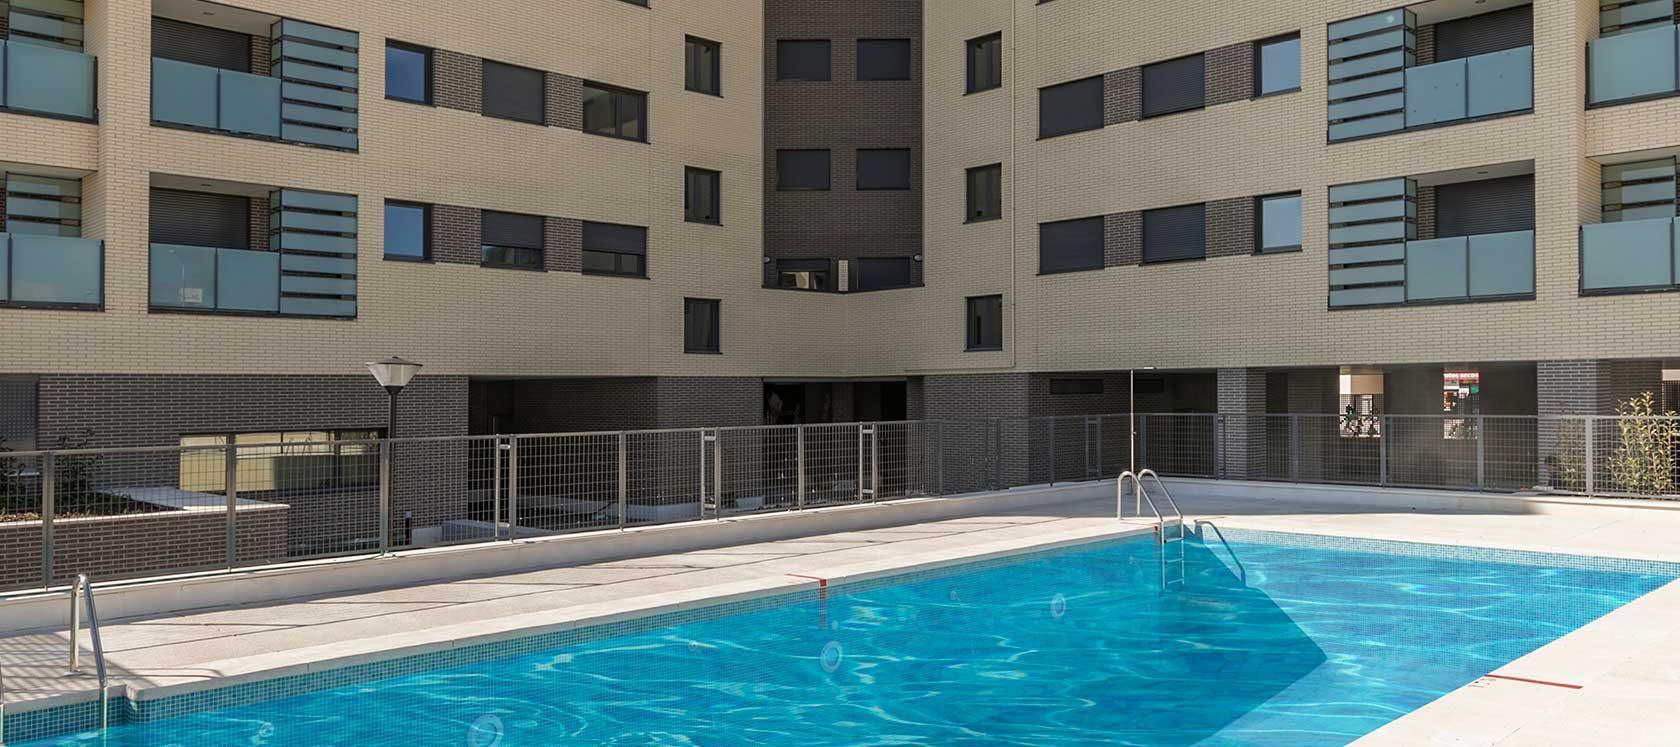 Vivienda nueva en Madrid celere-nueva-gavia